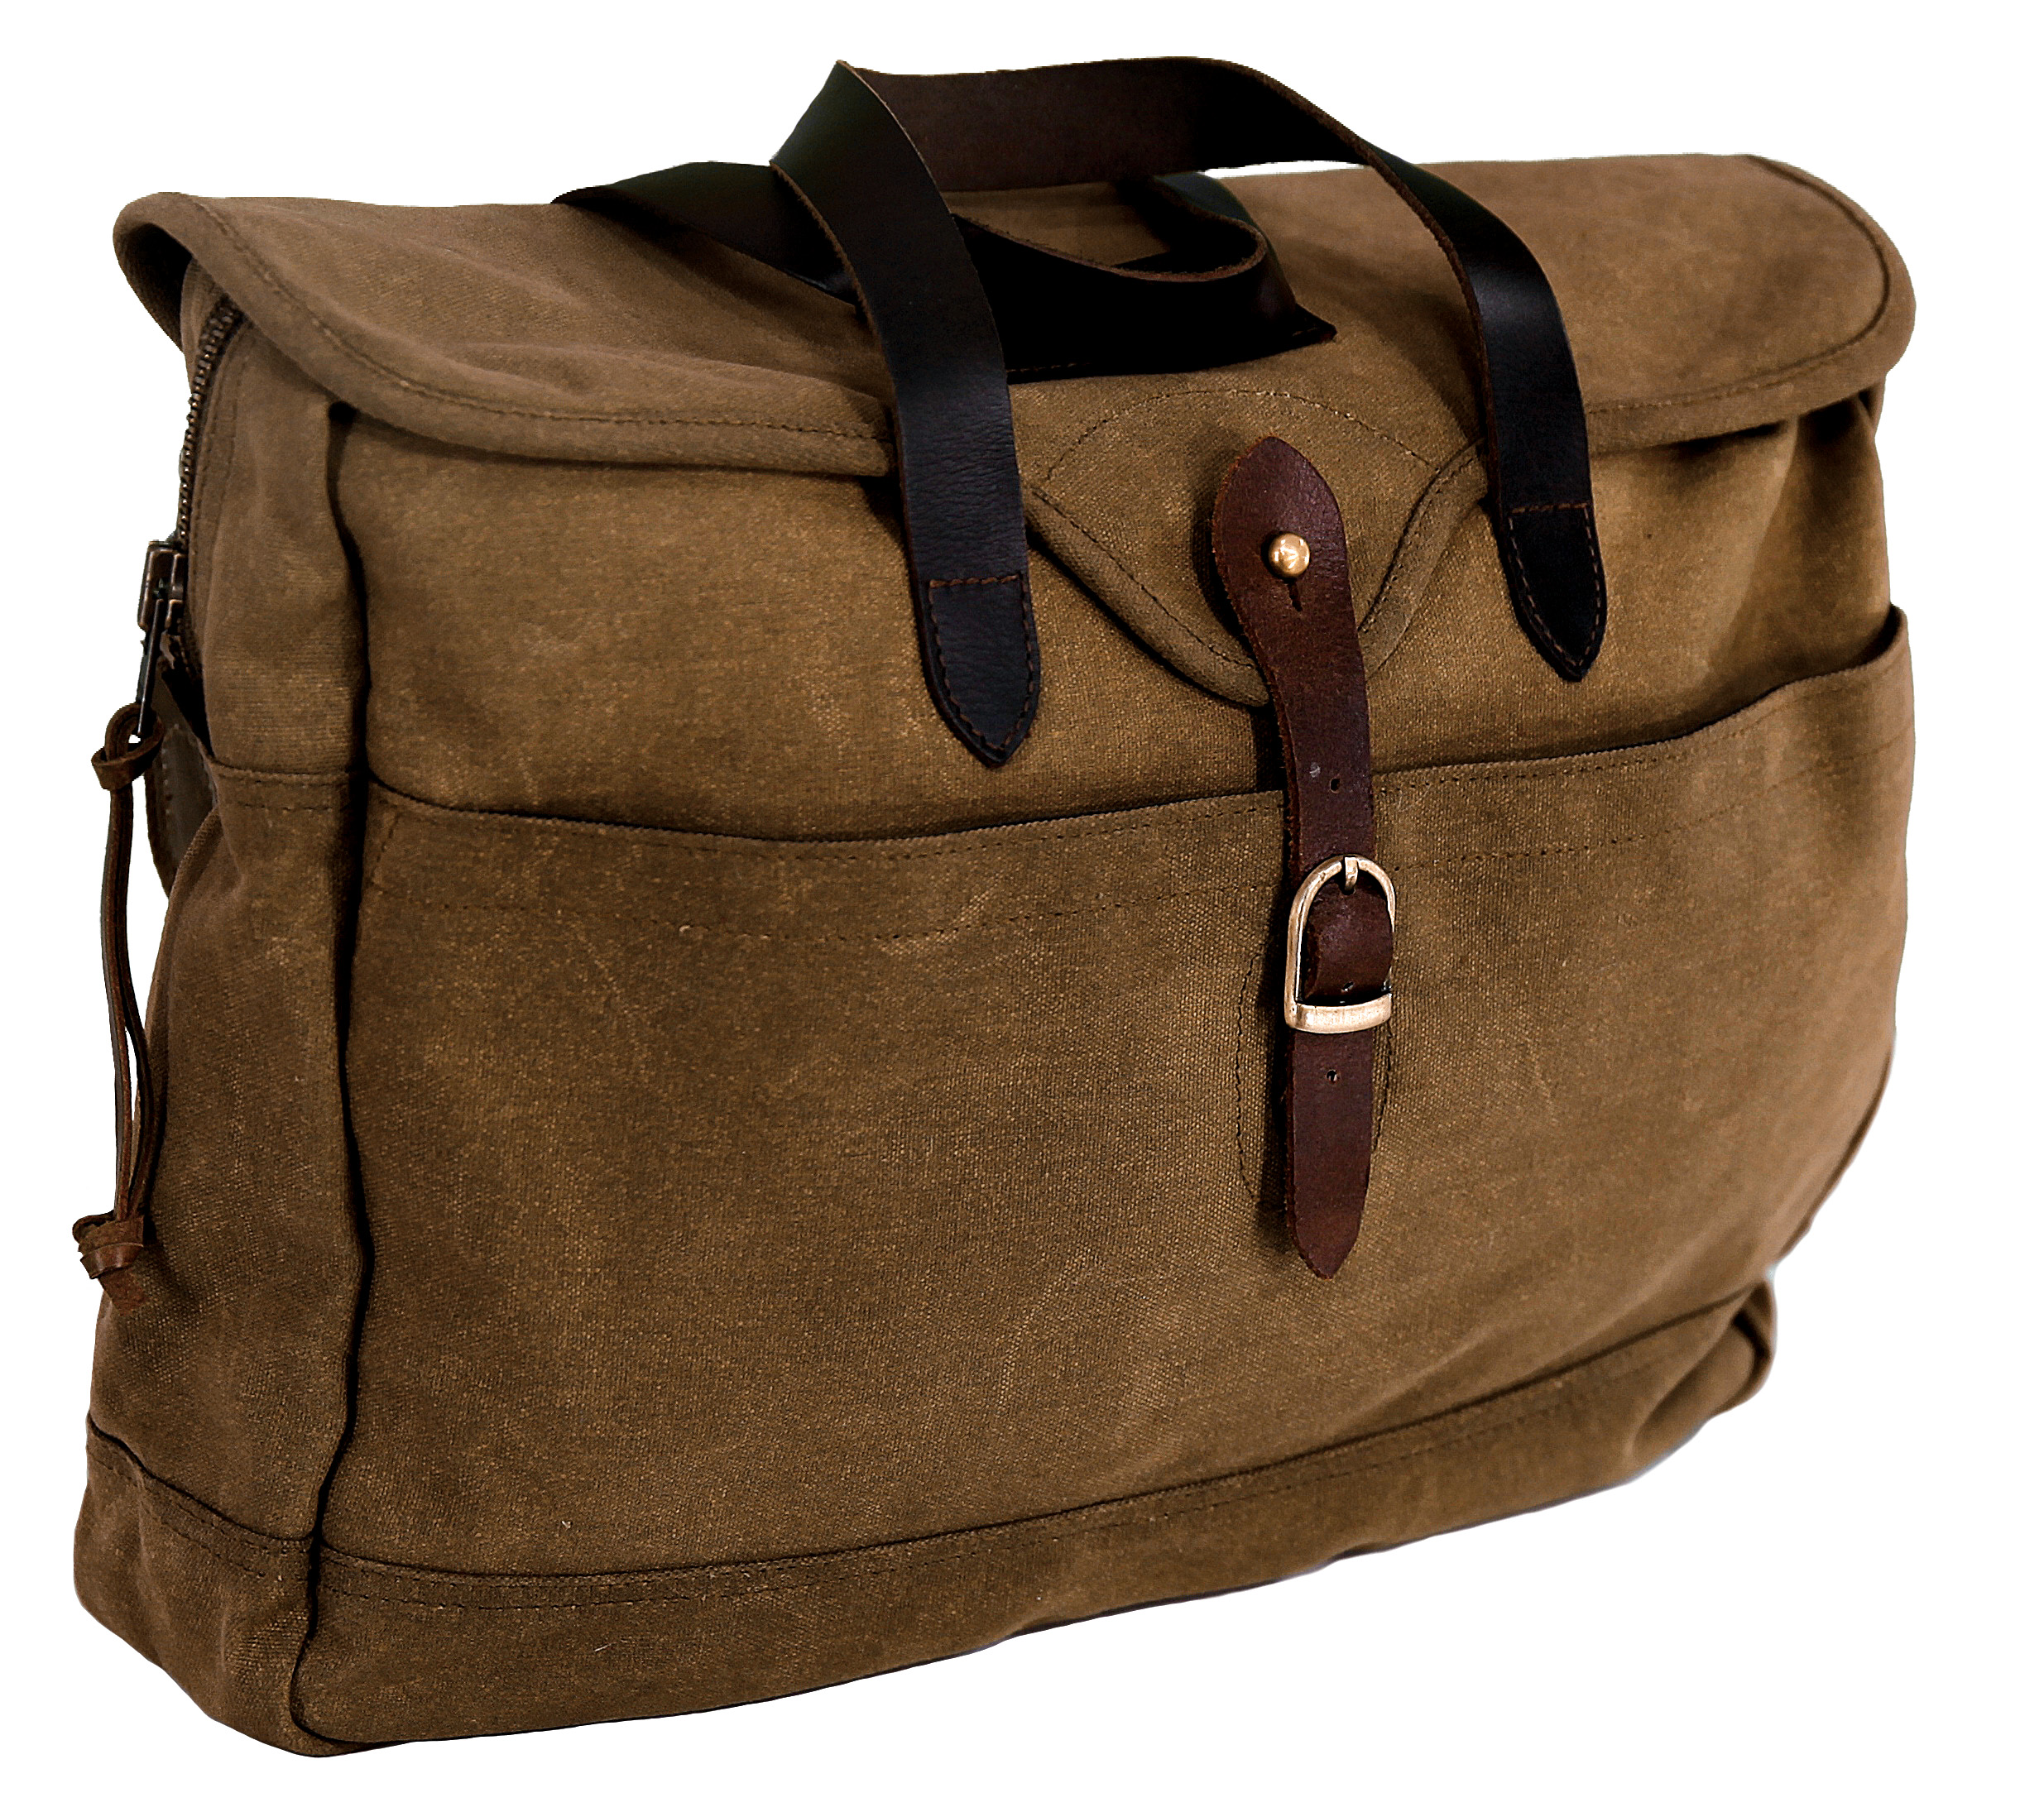 Outback Trading Outback Messenger Bag